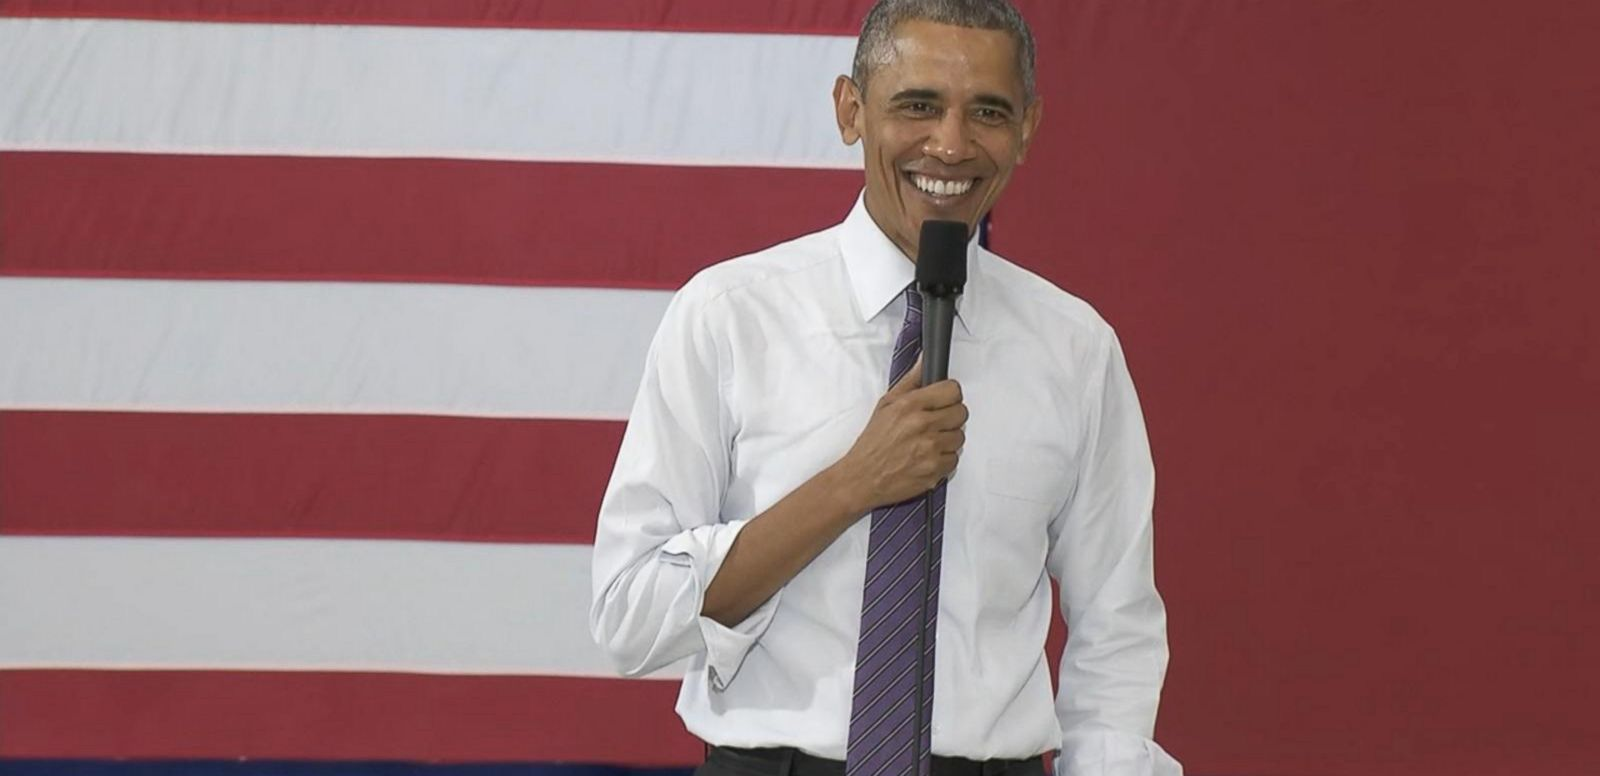 VIDEO: Obama Sings 'Davey Crockett' To Man Actually Named Davey Crockett